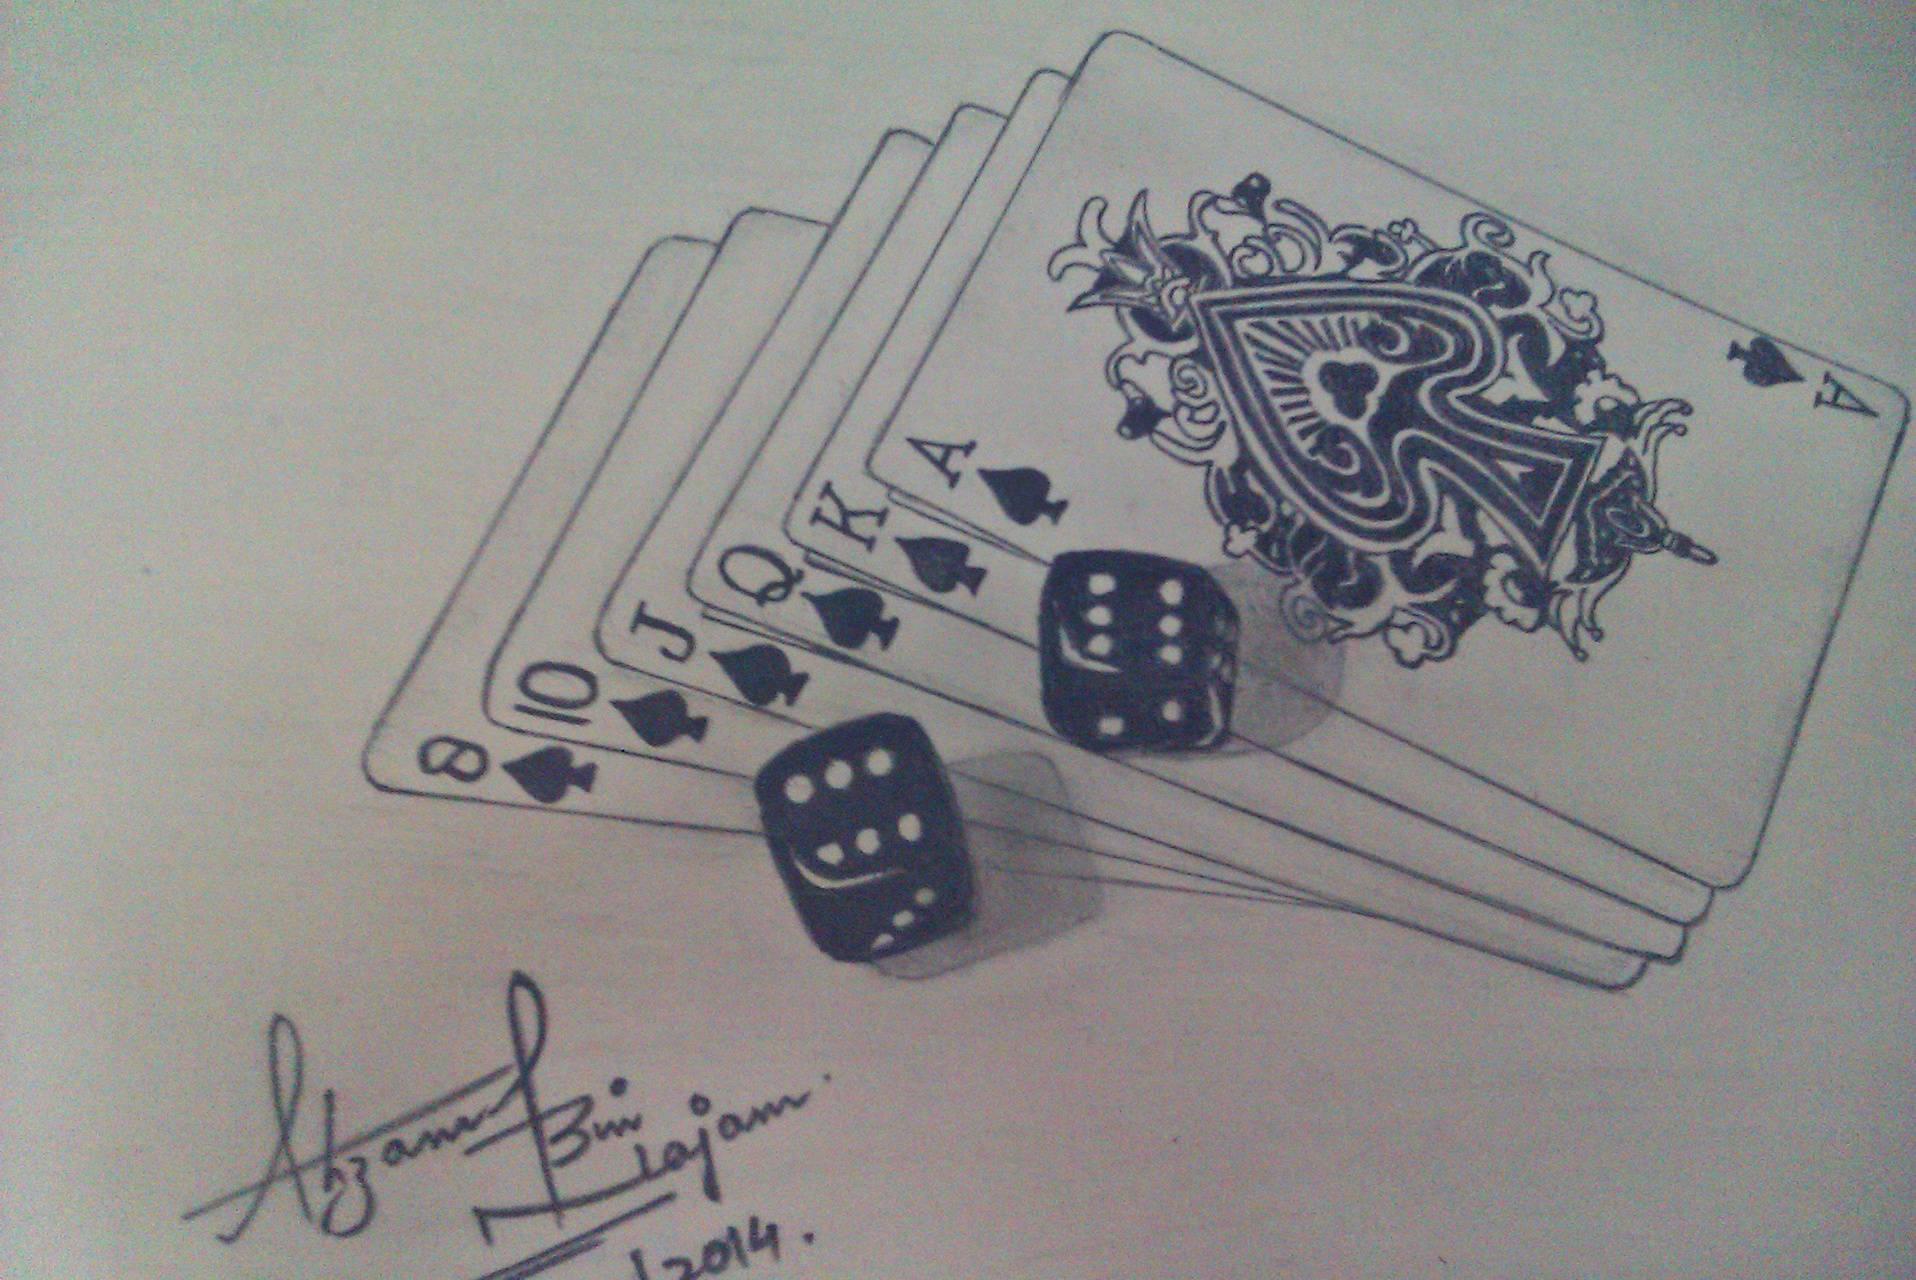 Playing card sketch